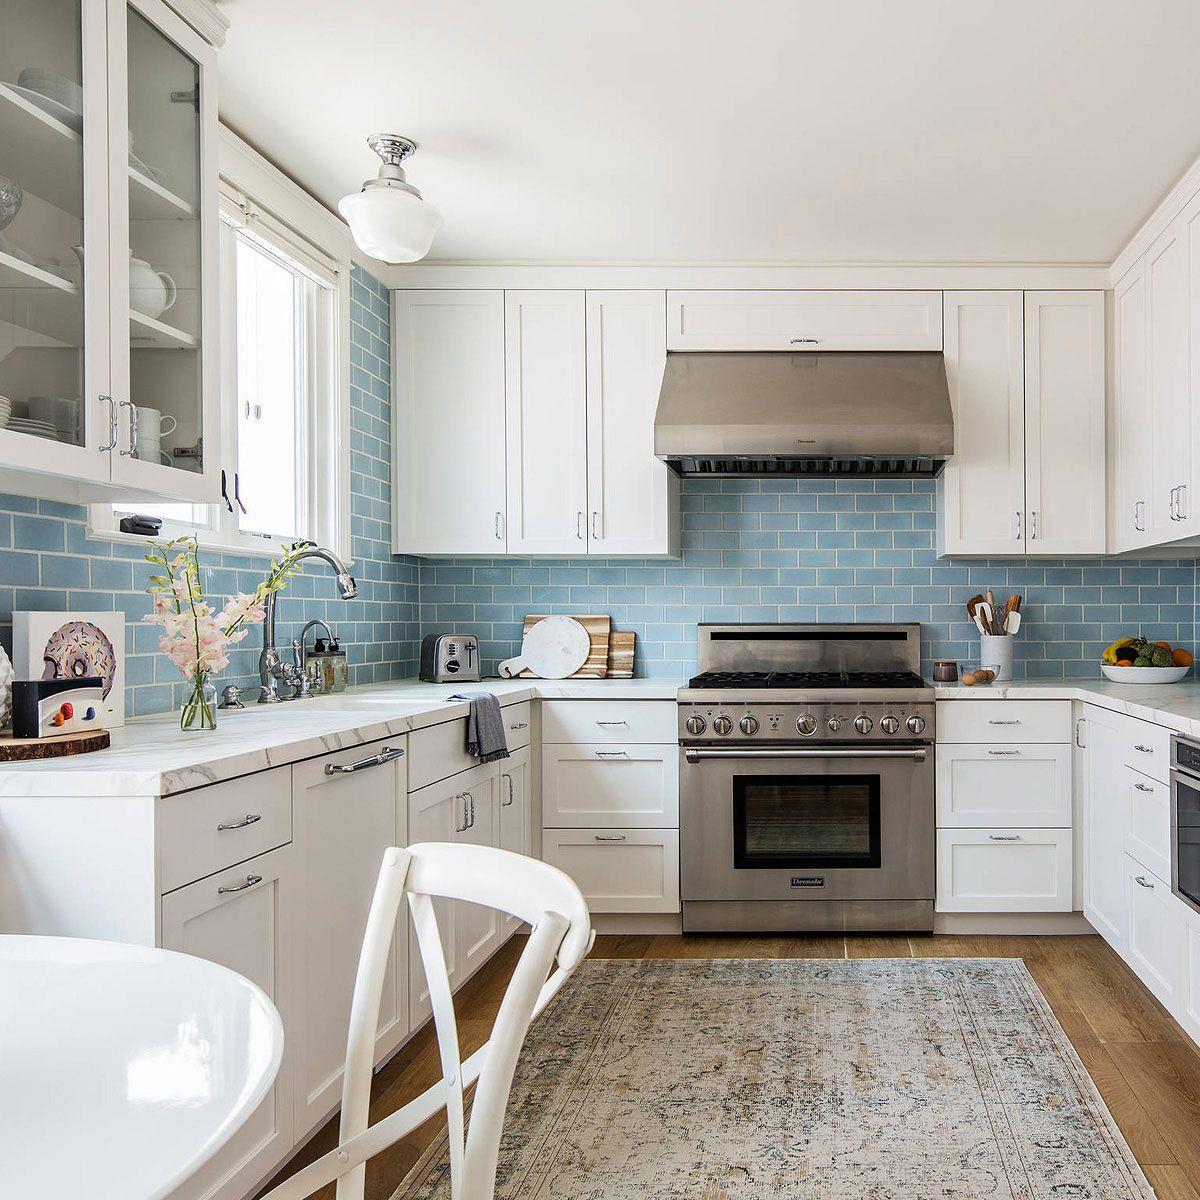 75 Blue Backsplash Ideas Navy Aqua Royal Or Coastal Blue Design Blue Backsplash Kitchen Blue Backsplash White Shaker Kitchen Coastal kitchen backsplash ideas